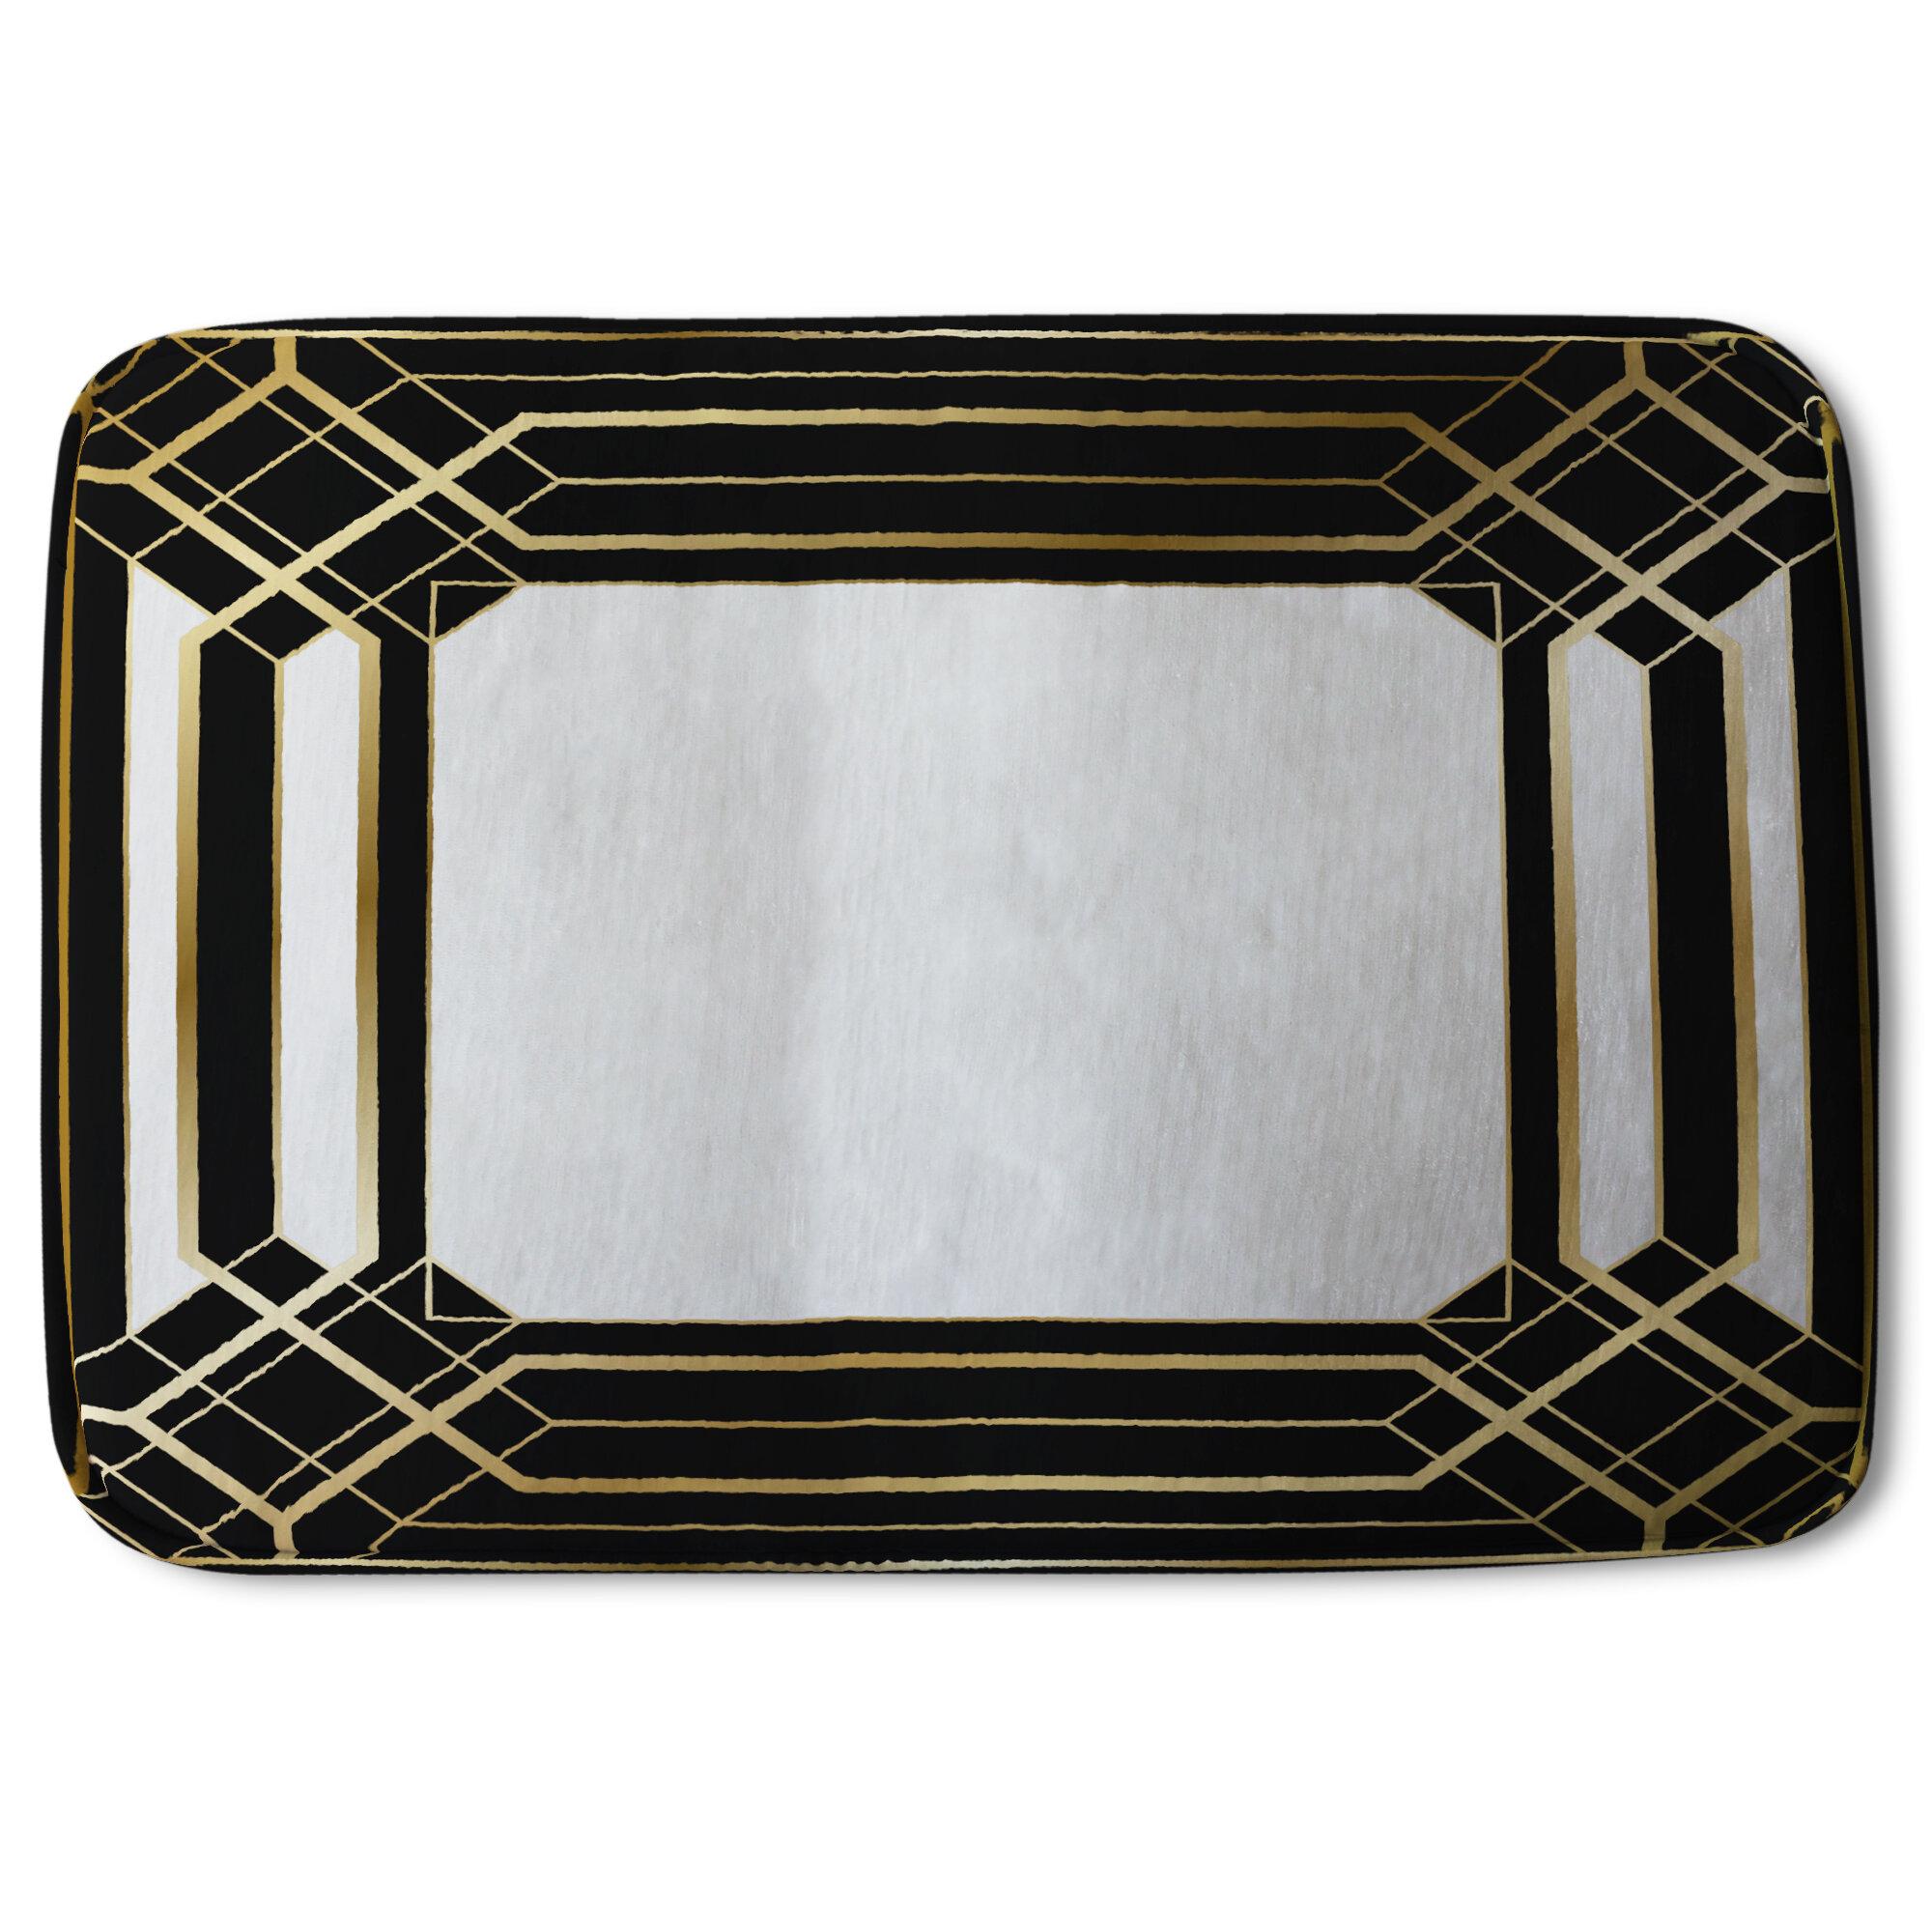 Everly Quinn Mathais Art Deco Frame Designer Rectangle Non Slip Bath Rug